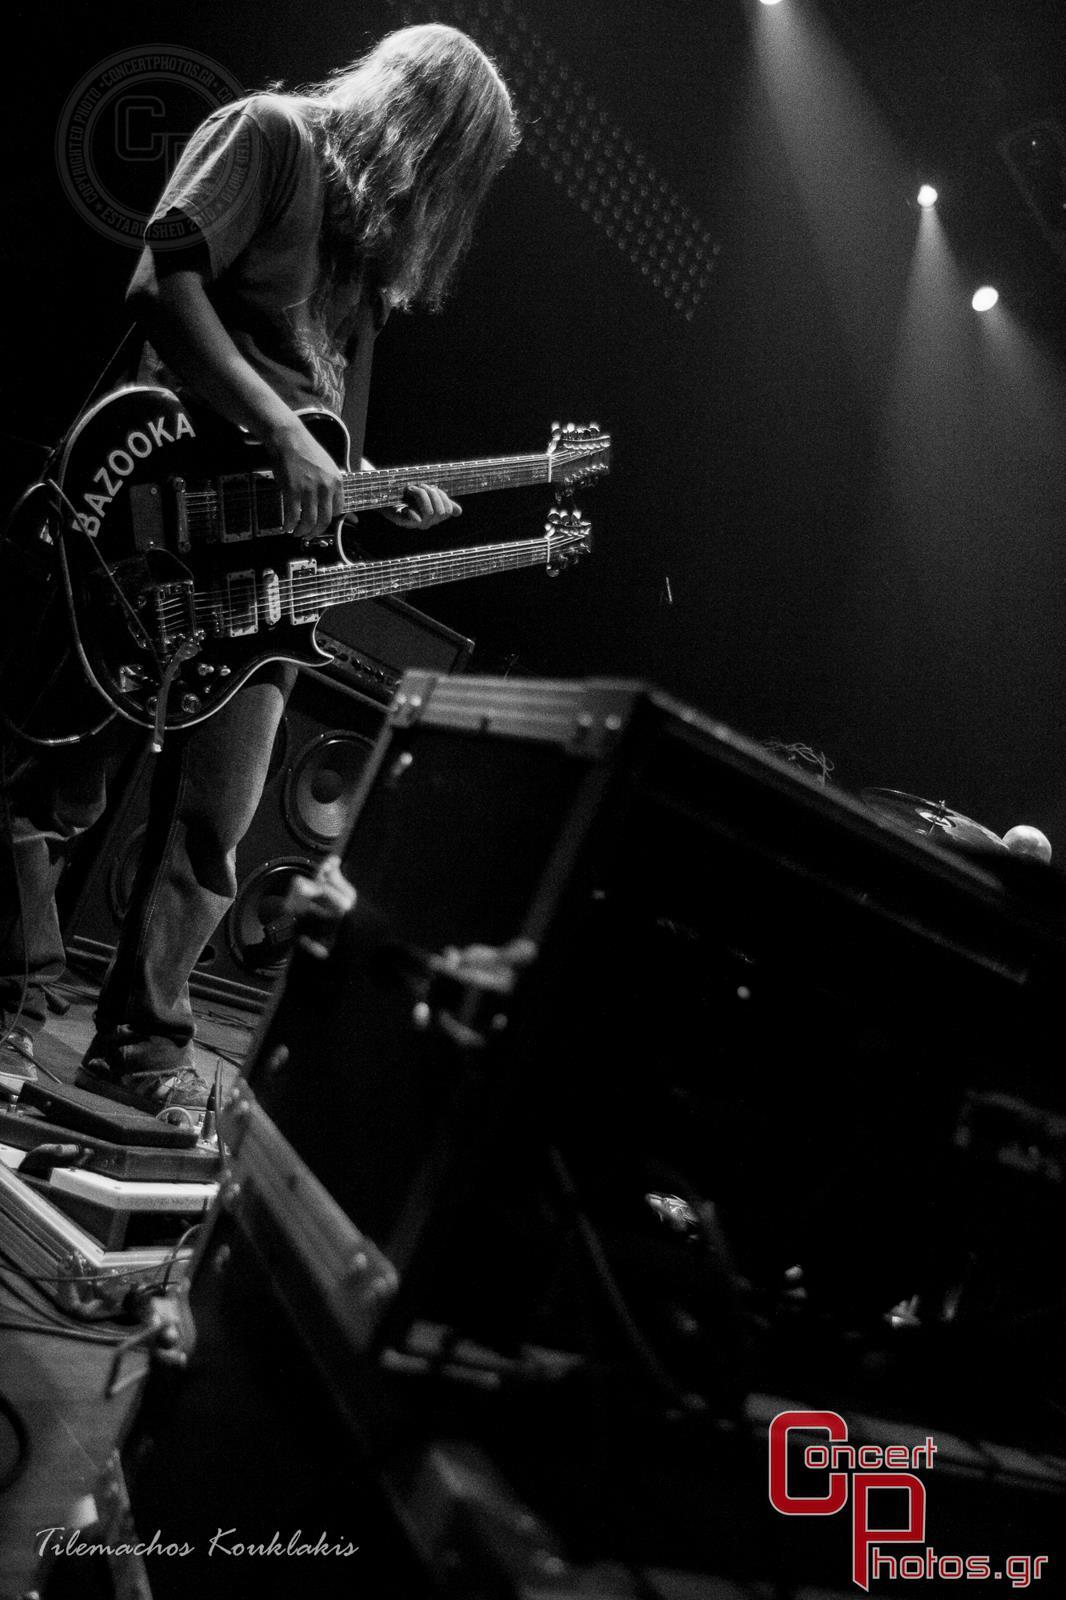 Neurosis-Neurosis photographer:  - concertphotos_20140707_23_56_50-2